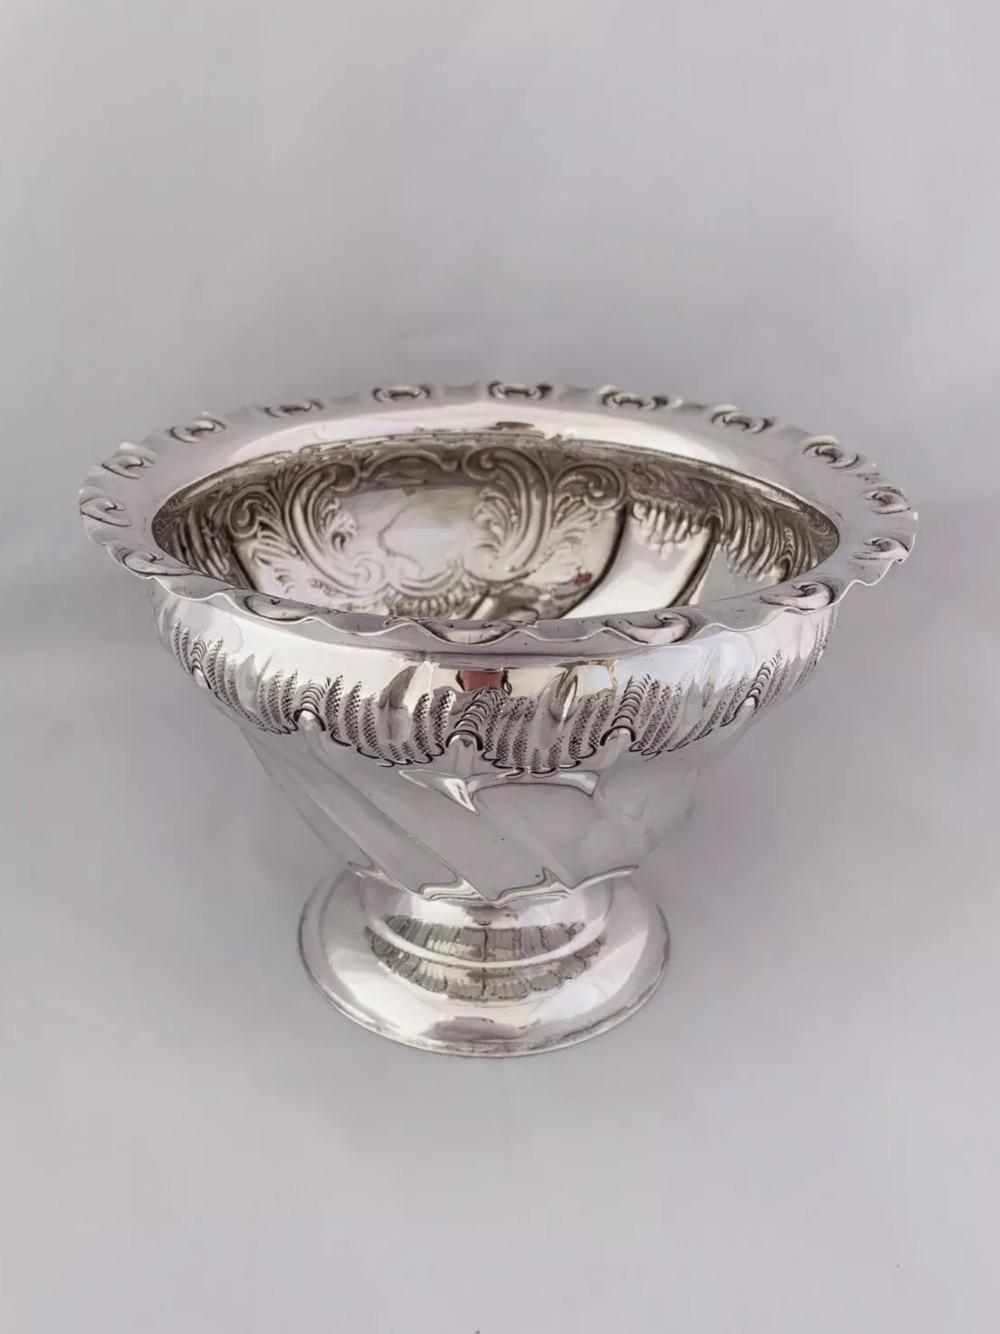 edwardian sterling silver sugar or sweet bowl 1908 sheffield henry atkin